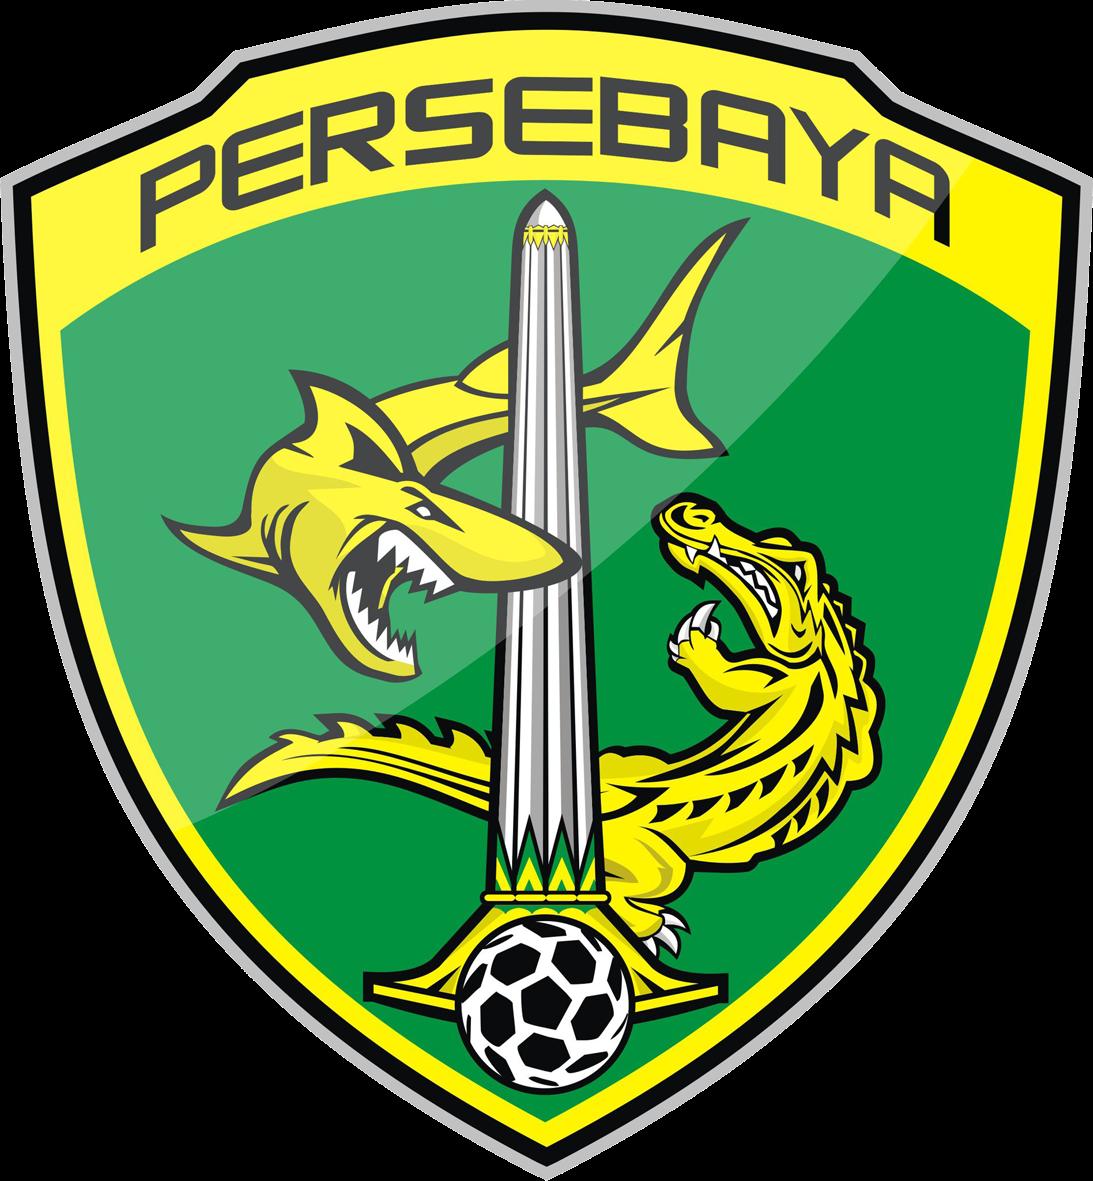 LOGO KEREN PERSEBAYA FC Gambar Kartun Lucu Dan Wallpaper Keren